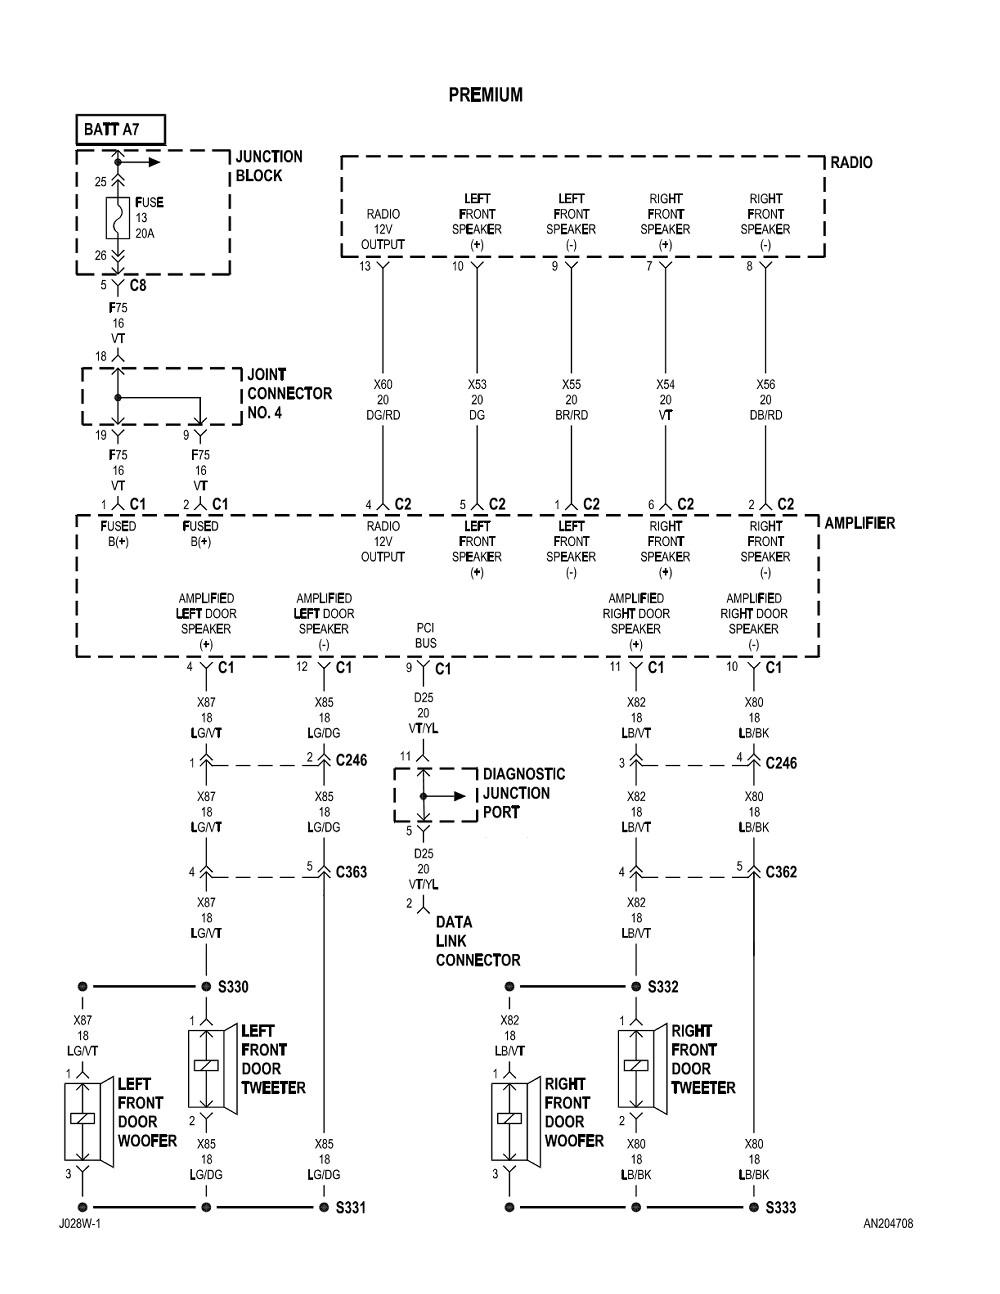 medium resolution of 98 dakota radio wiring diagram complete wiring diagrams u2022 rh oldorchardfarm co 2005 dodge caravan radio 2007